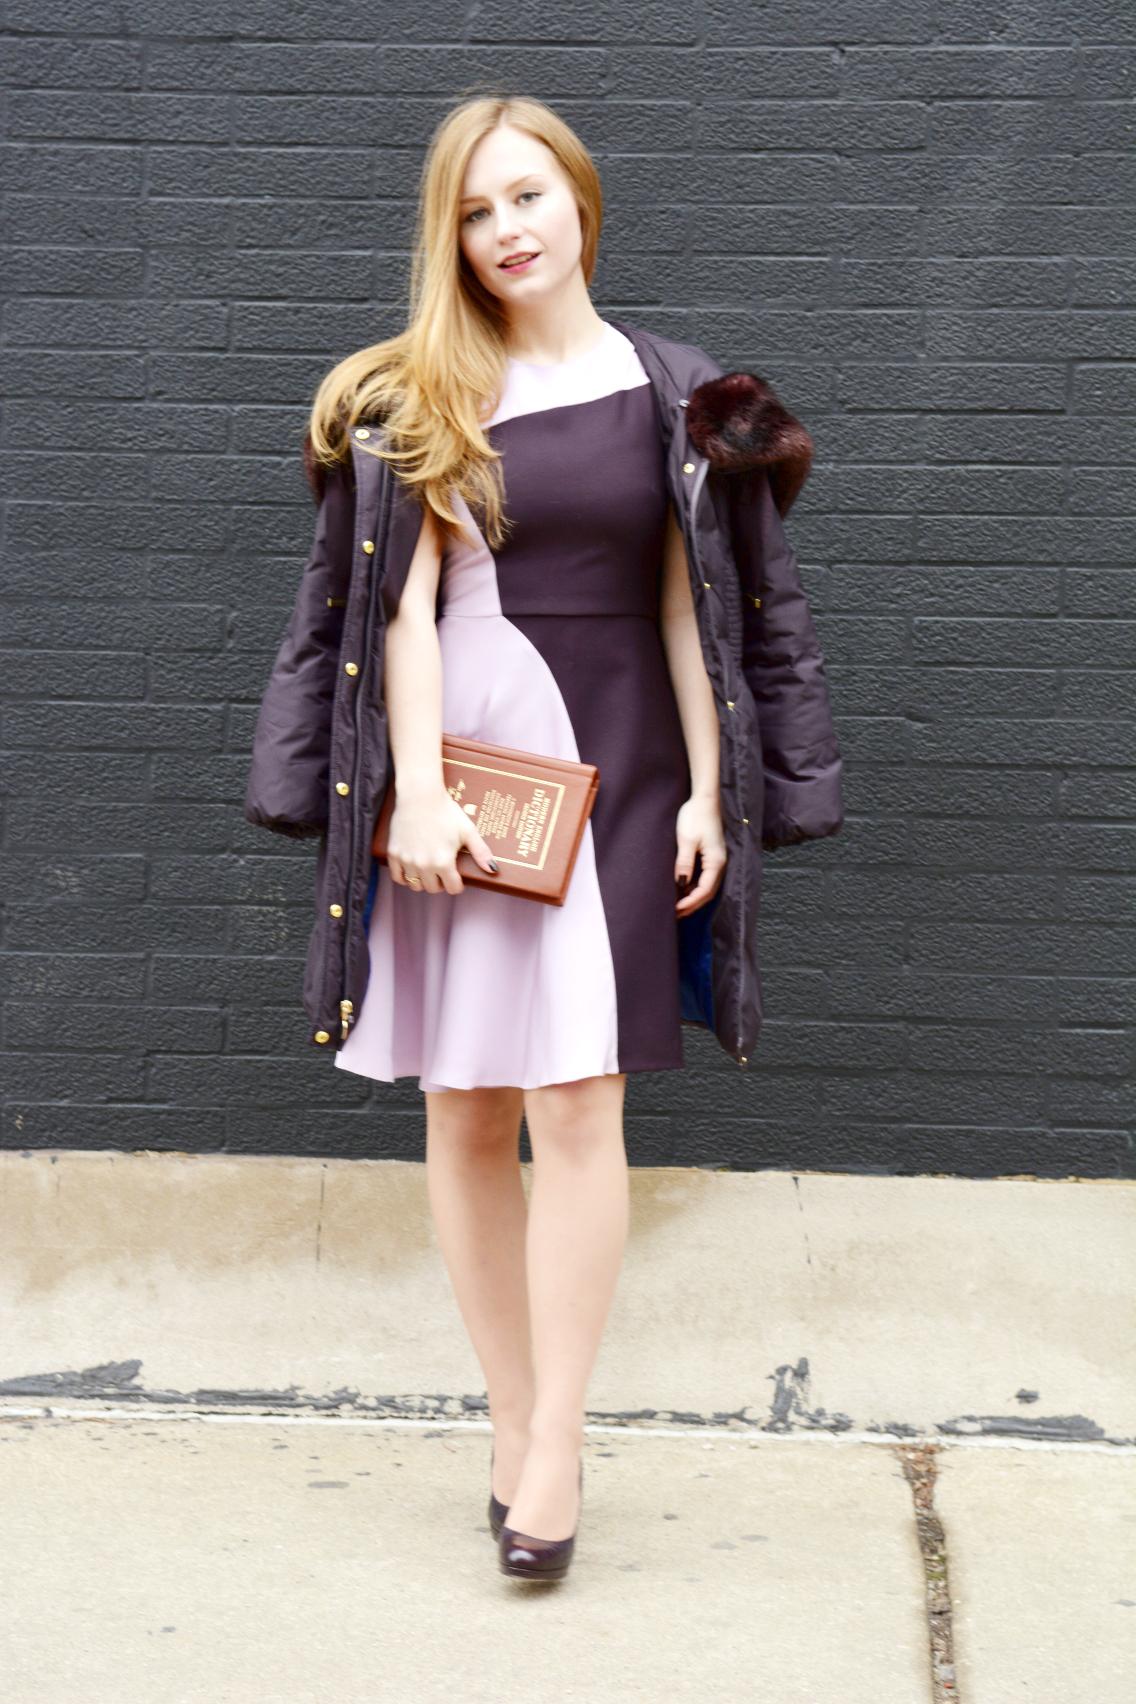 3.1 Phillip Lim Colorblock Dress Kate Spade Dictionary Clutch 14